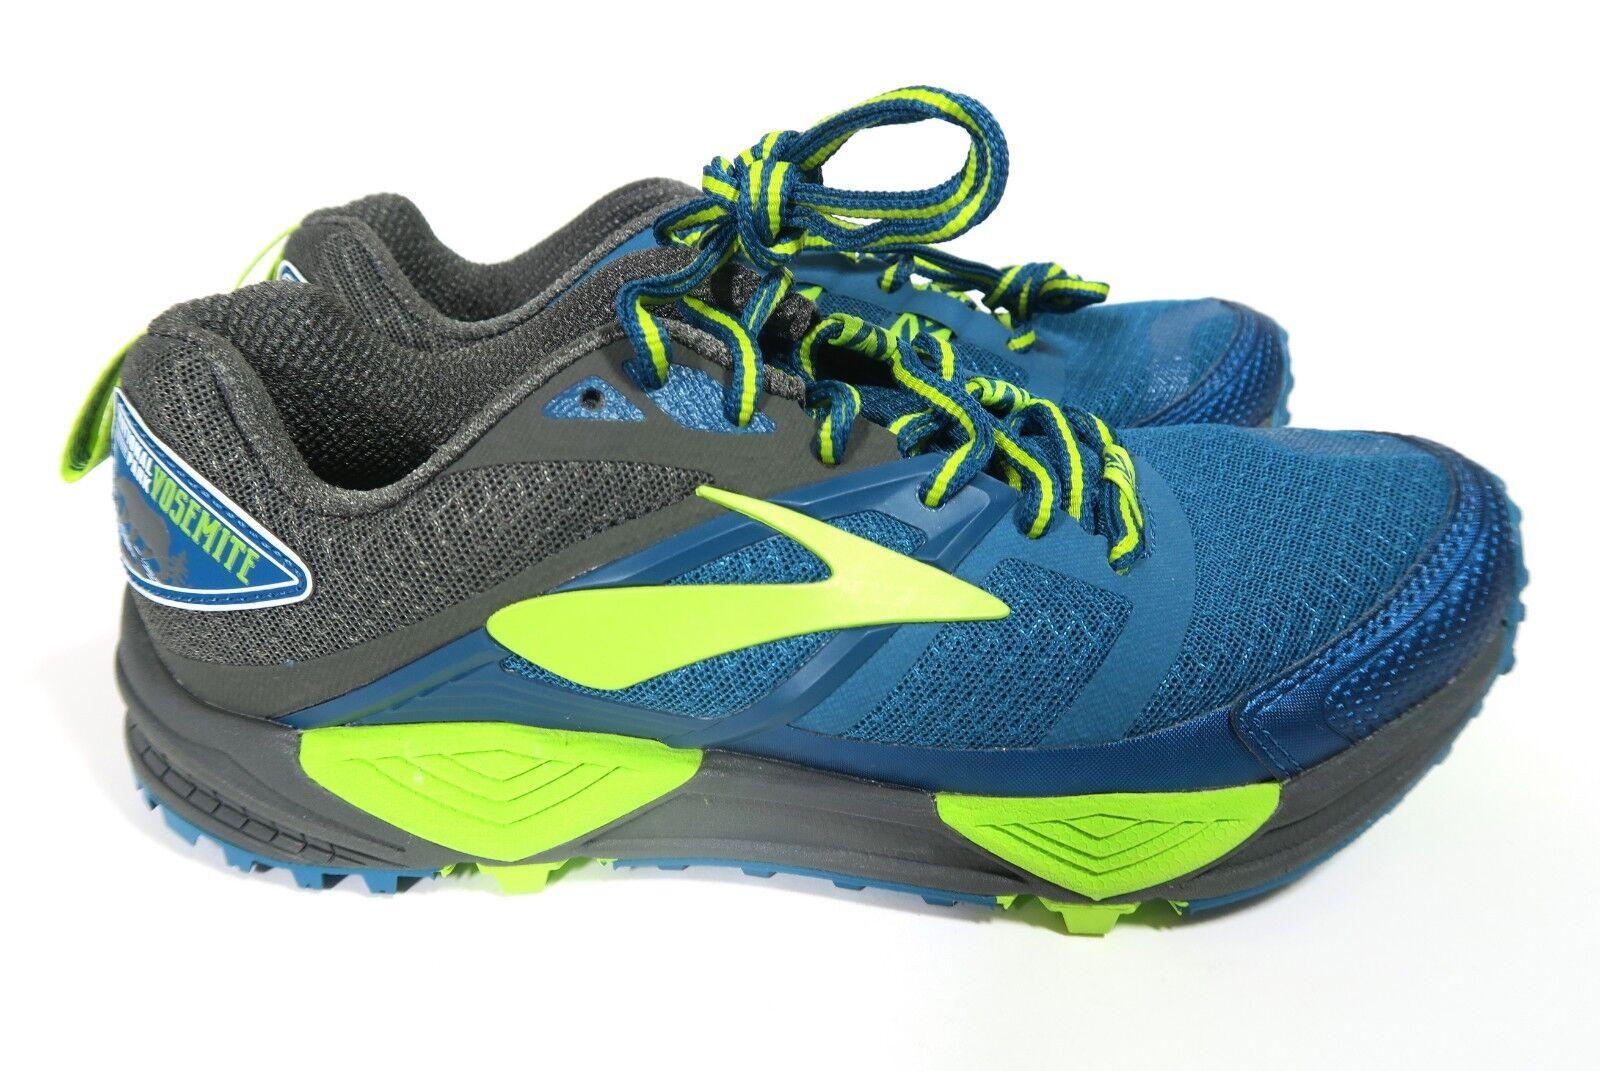 Nuevo para hombres Brooks Cascadia 12 Park Yosemite Trail Running Zapatos National US 8